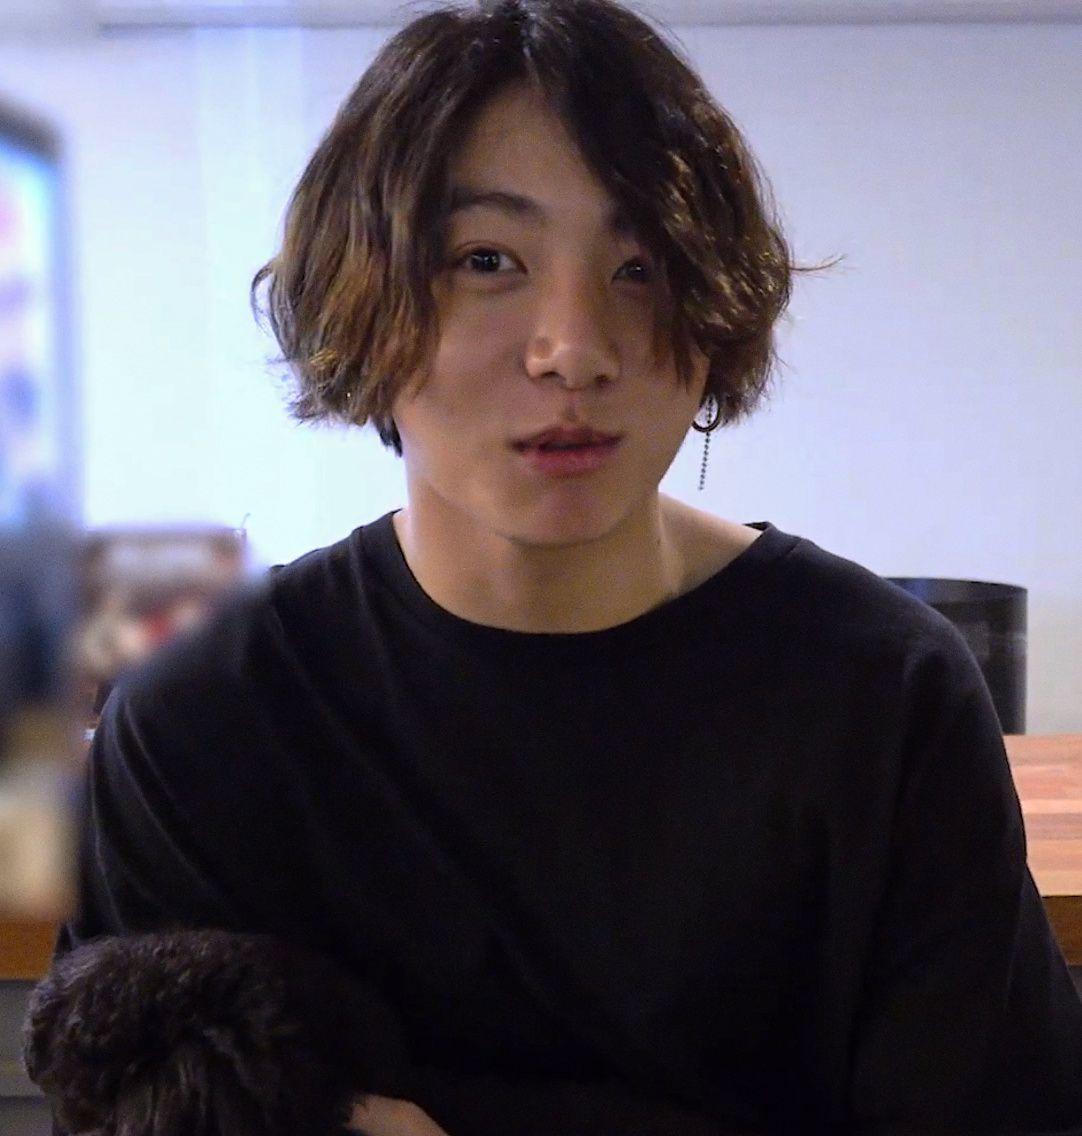 Jungkook Long Hair Jungkooklonghair Jungkook Jeon Jungkook Jeon